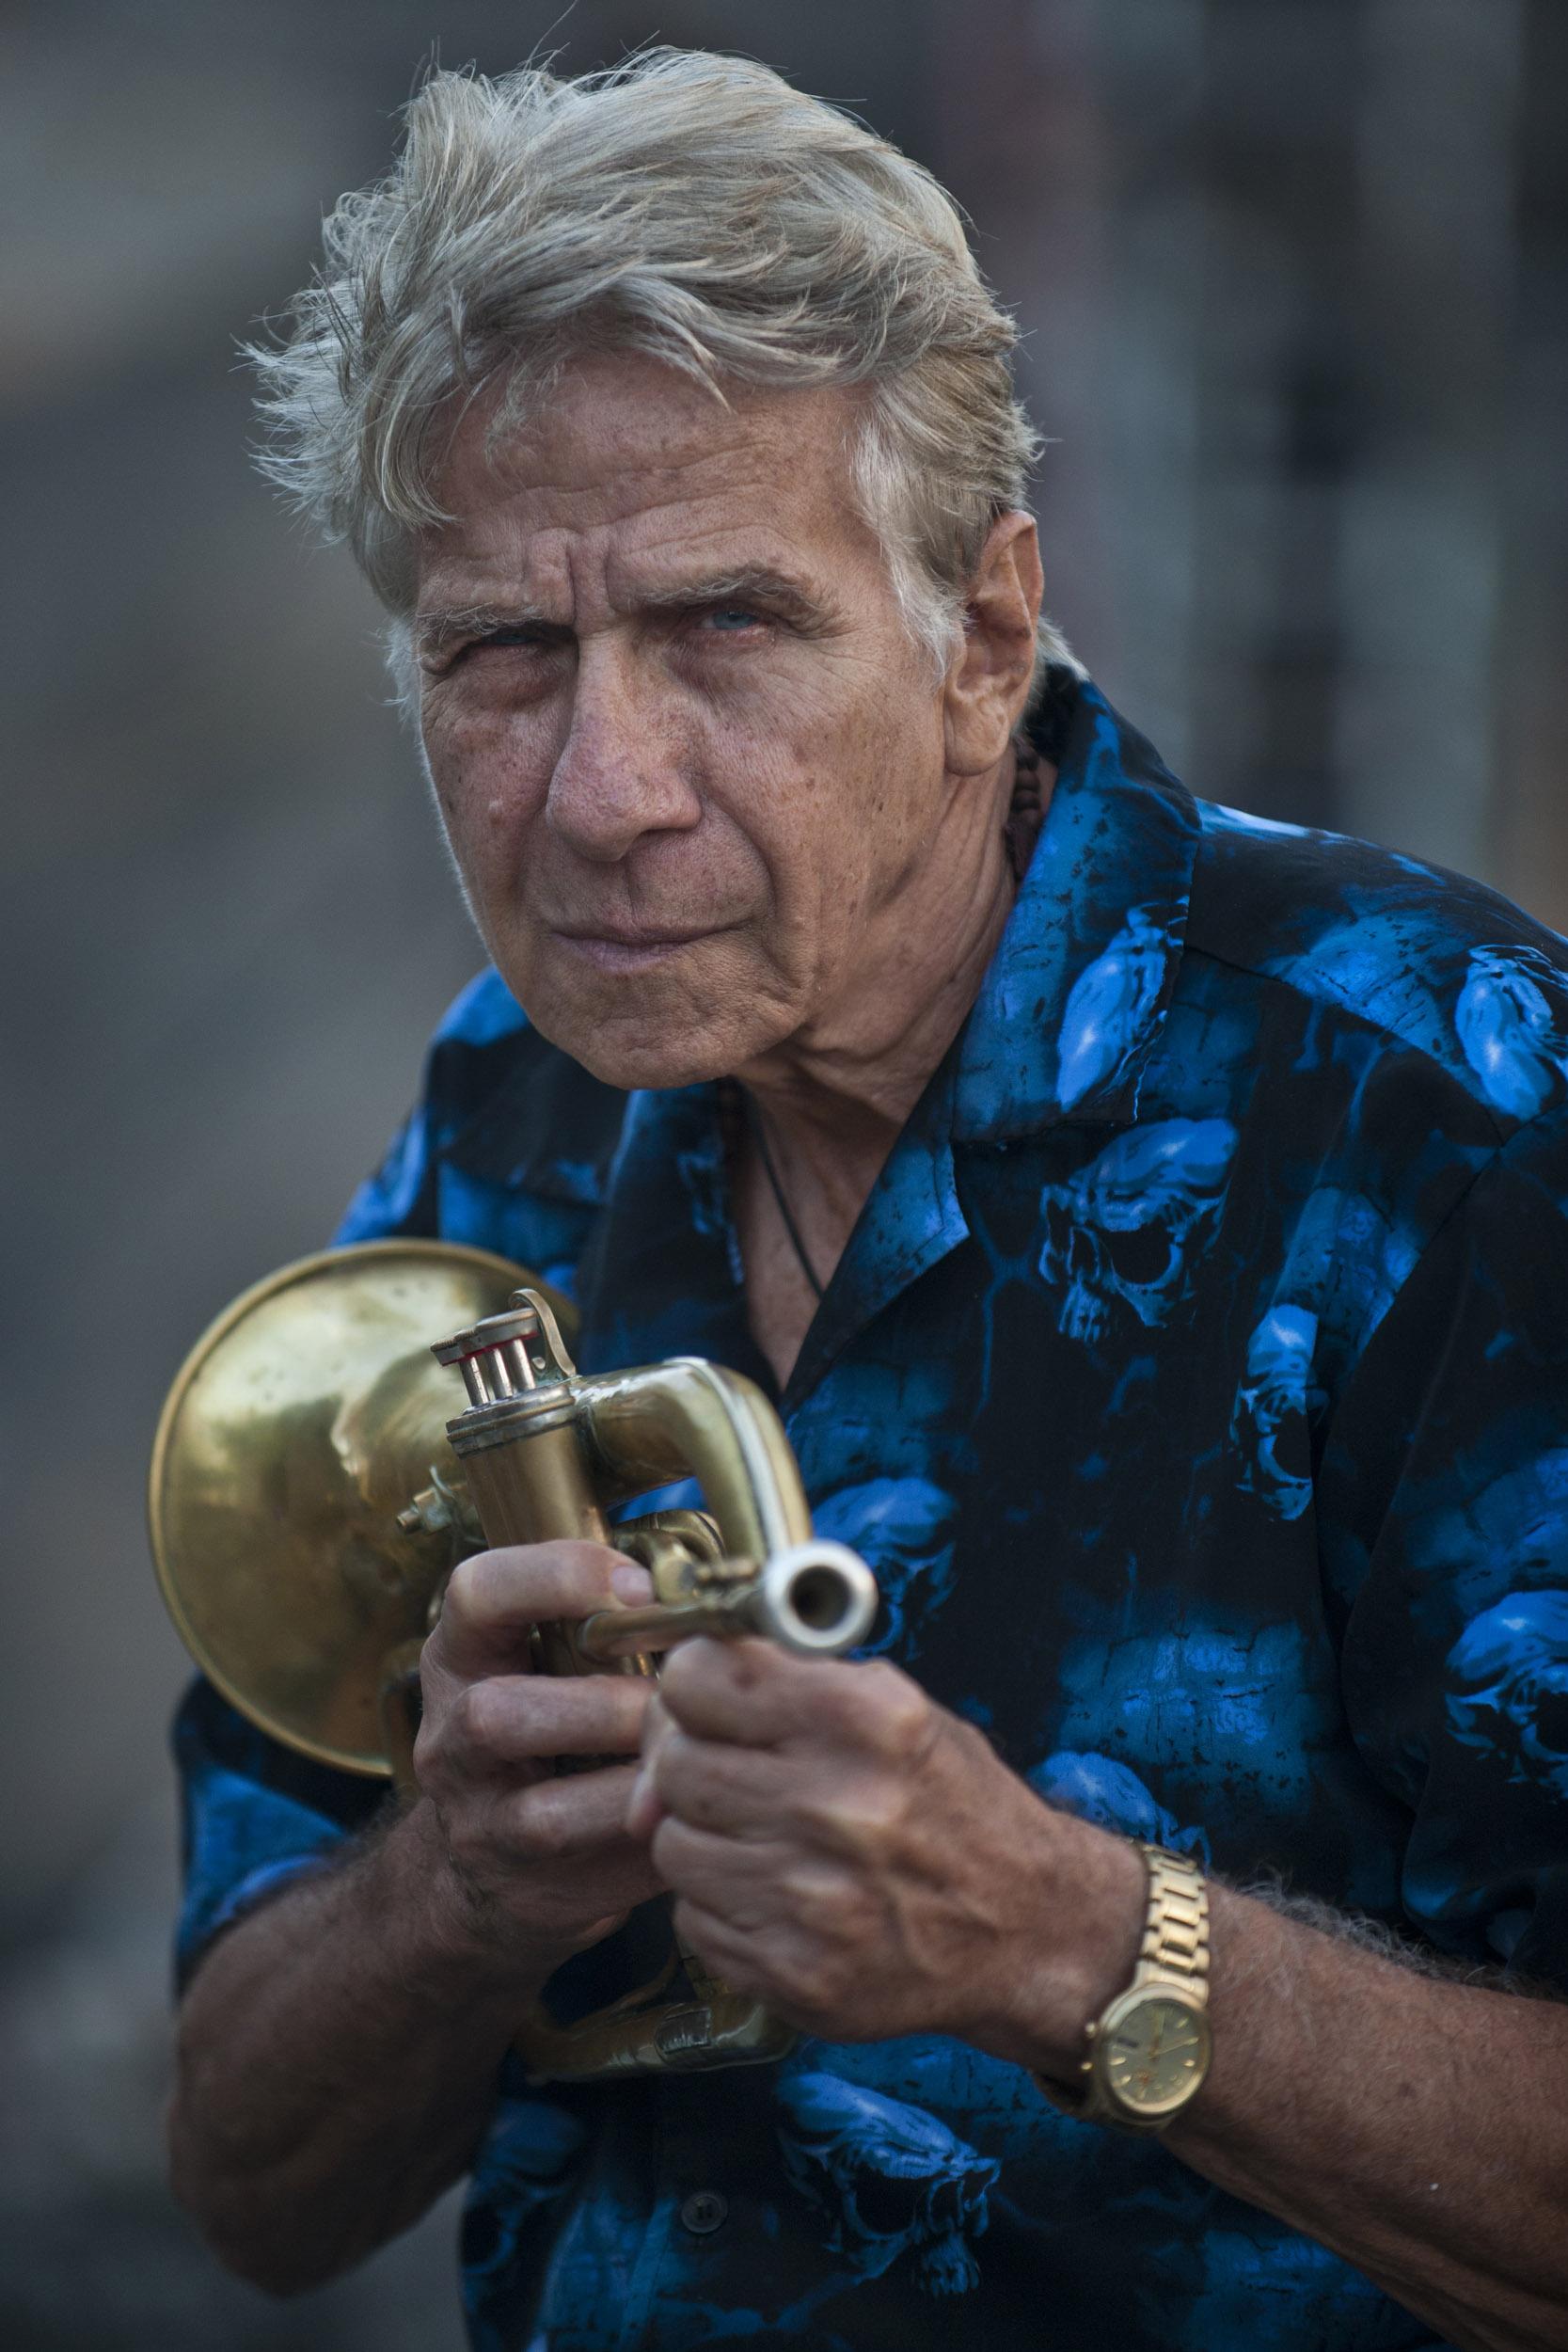 Boby Carcassés, musician - Illuminated Cuba - Hector Garrido, Aerial and human photography